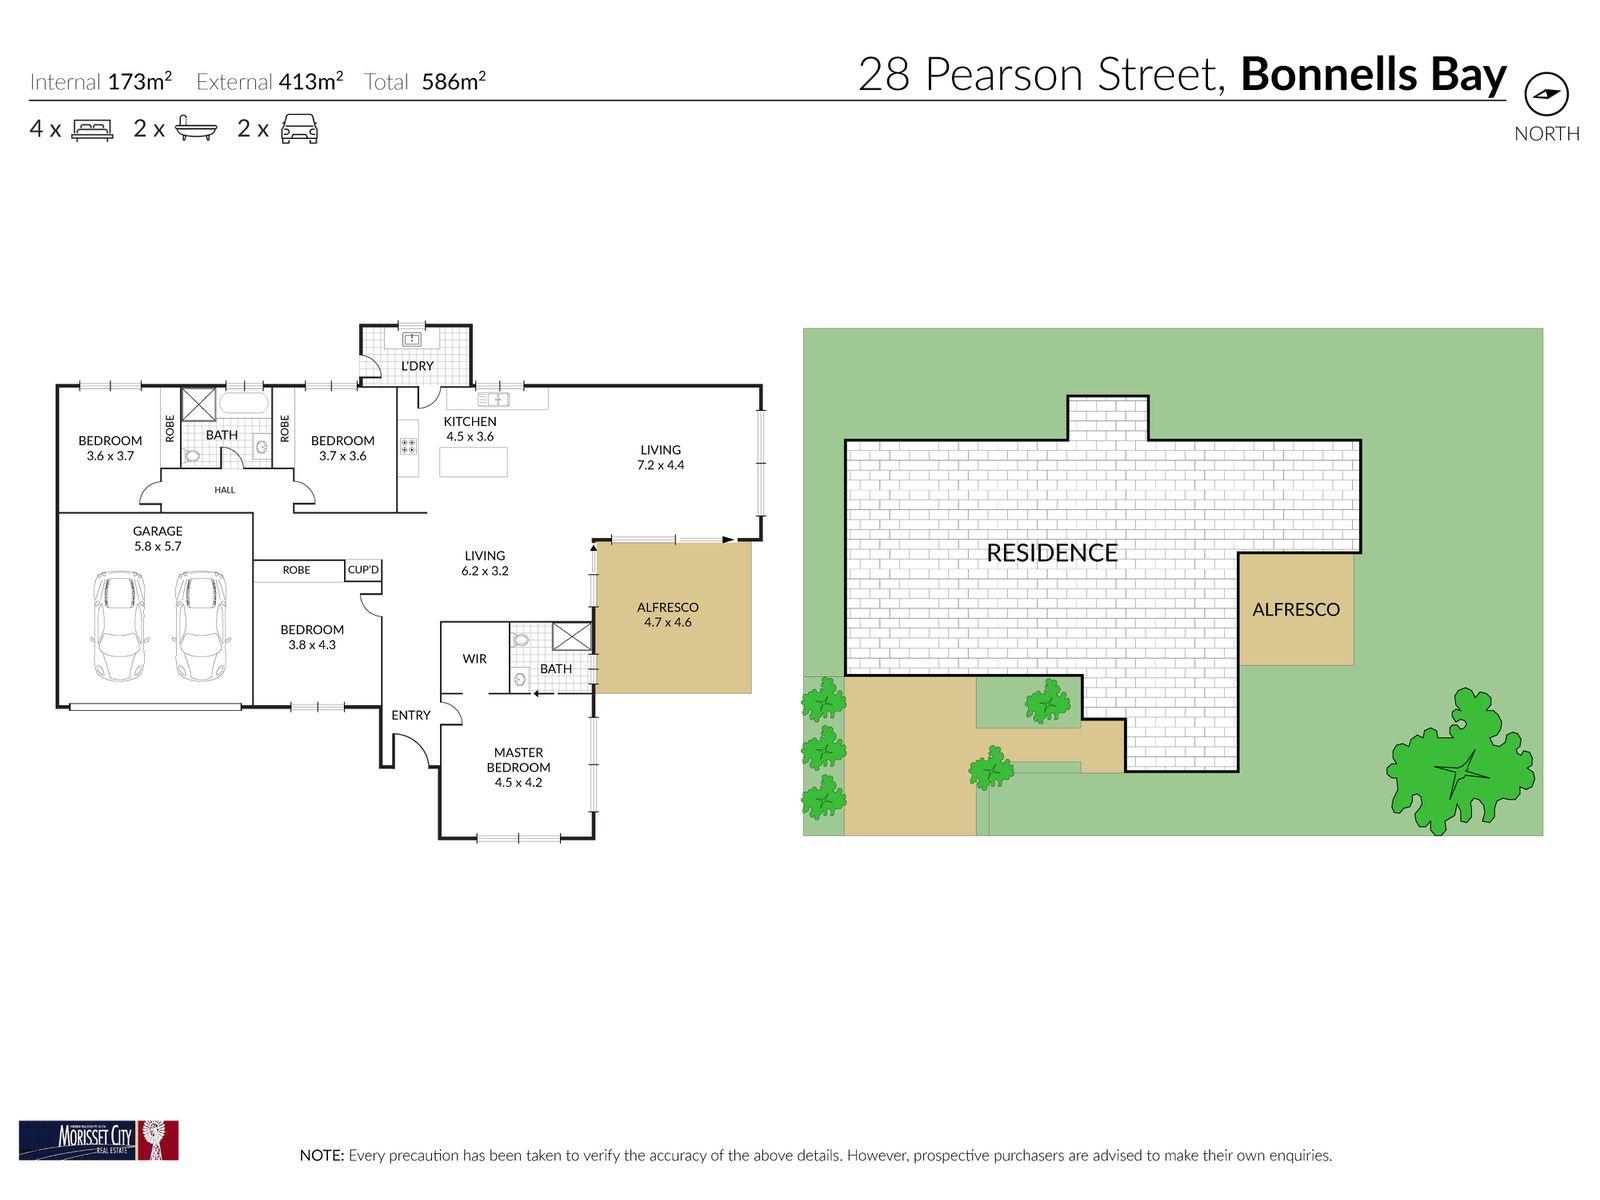 28 Pearson Street, Bonnells Bay